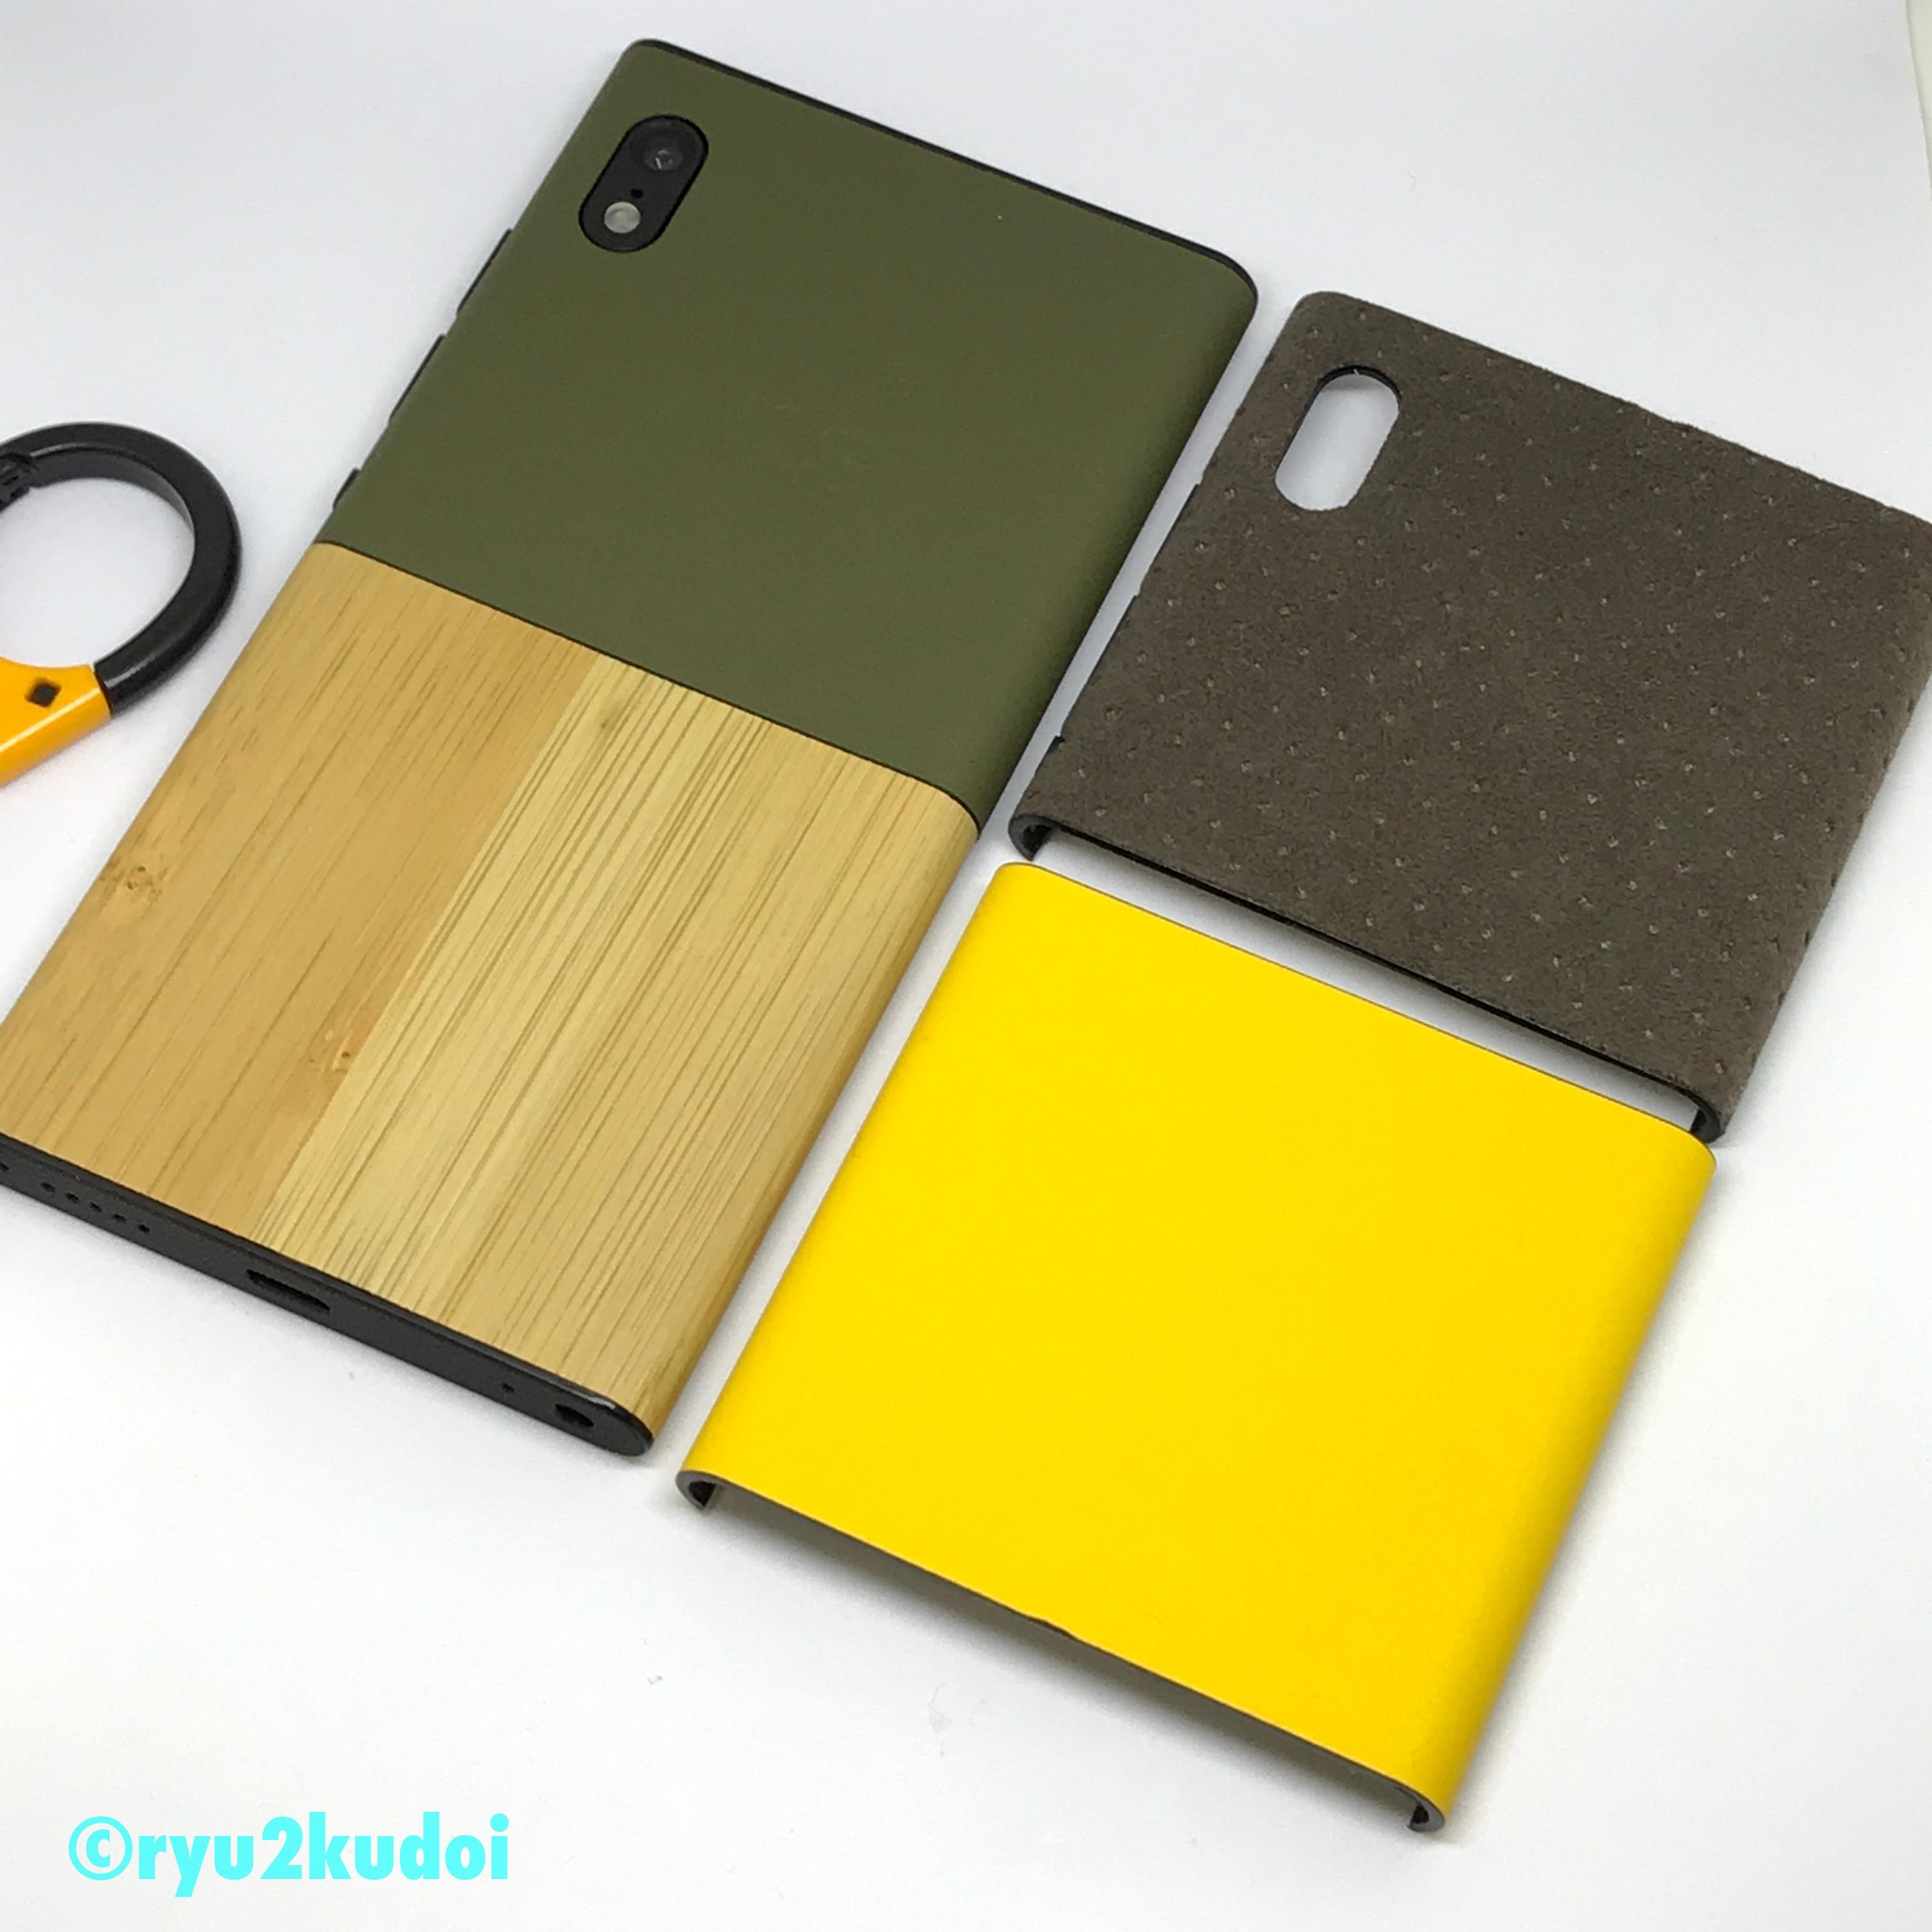 NuAns NEO [Reloaded]とは、恍惚のデザインを楽しめる唯一無二のAndroidスマートフォンである!!!